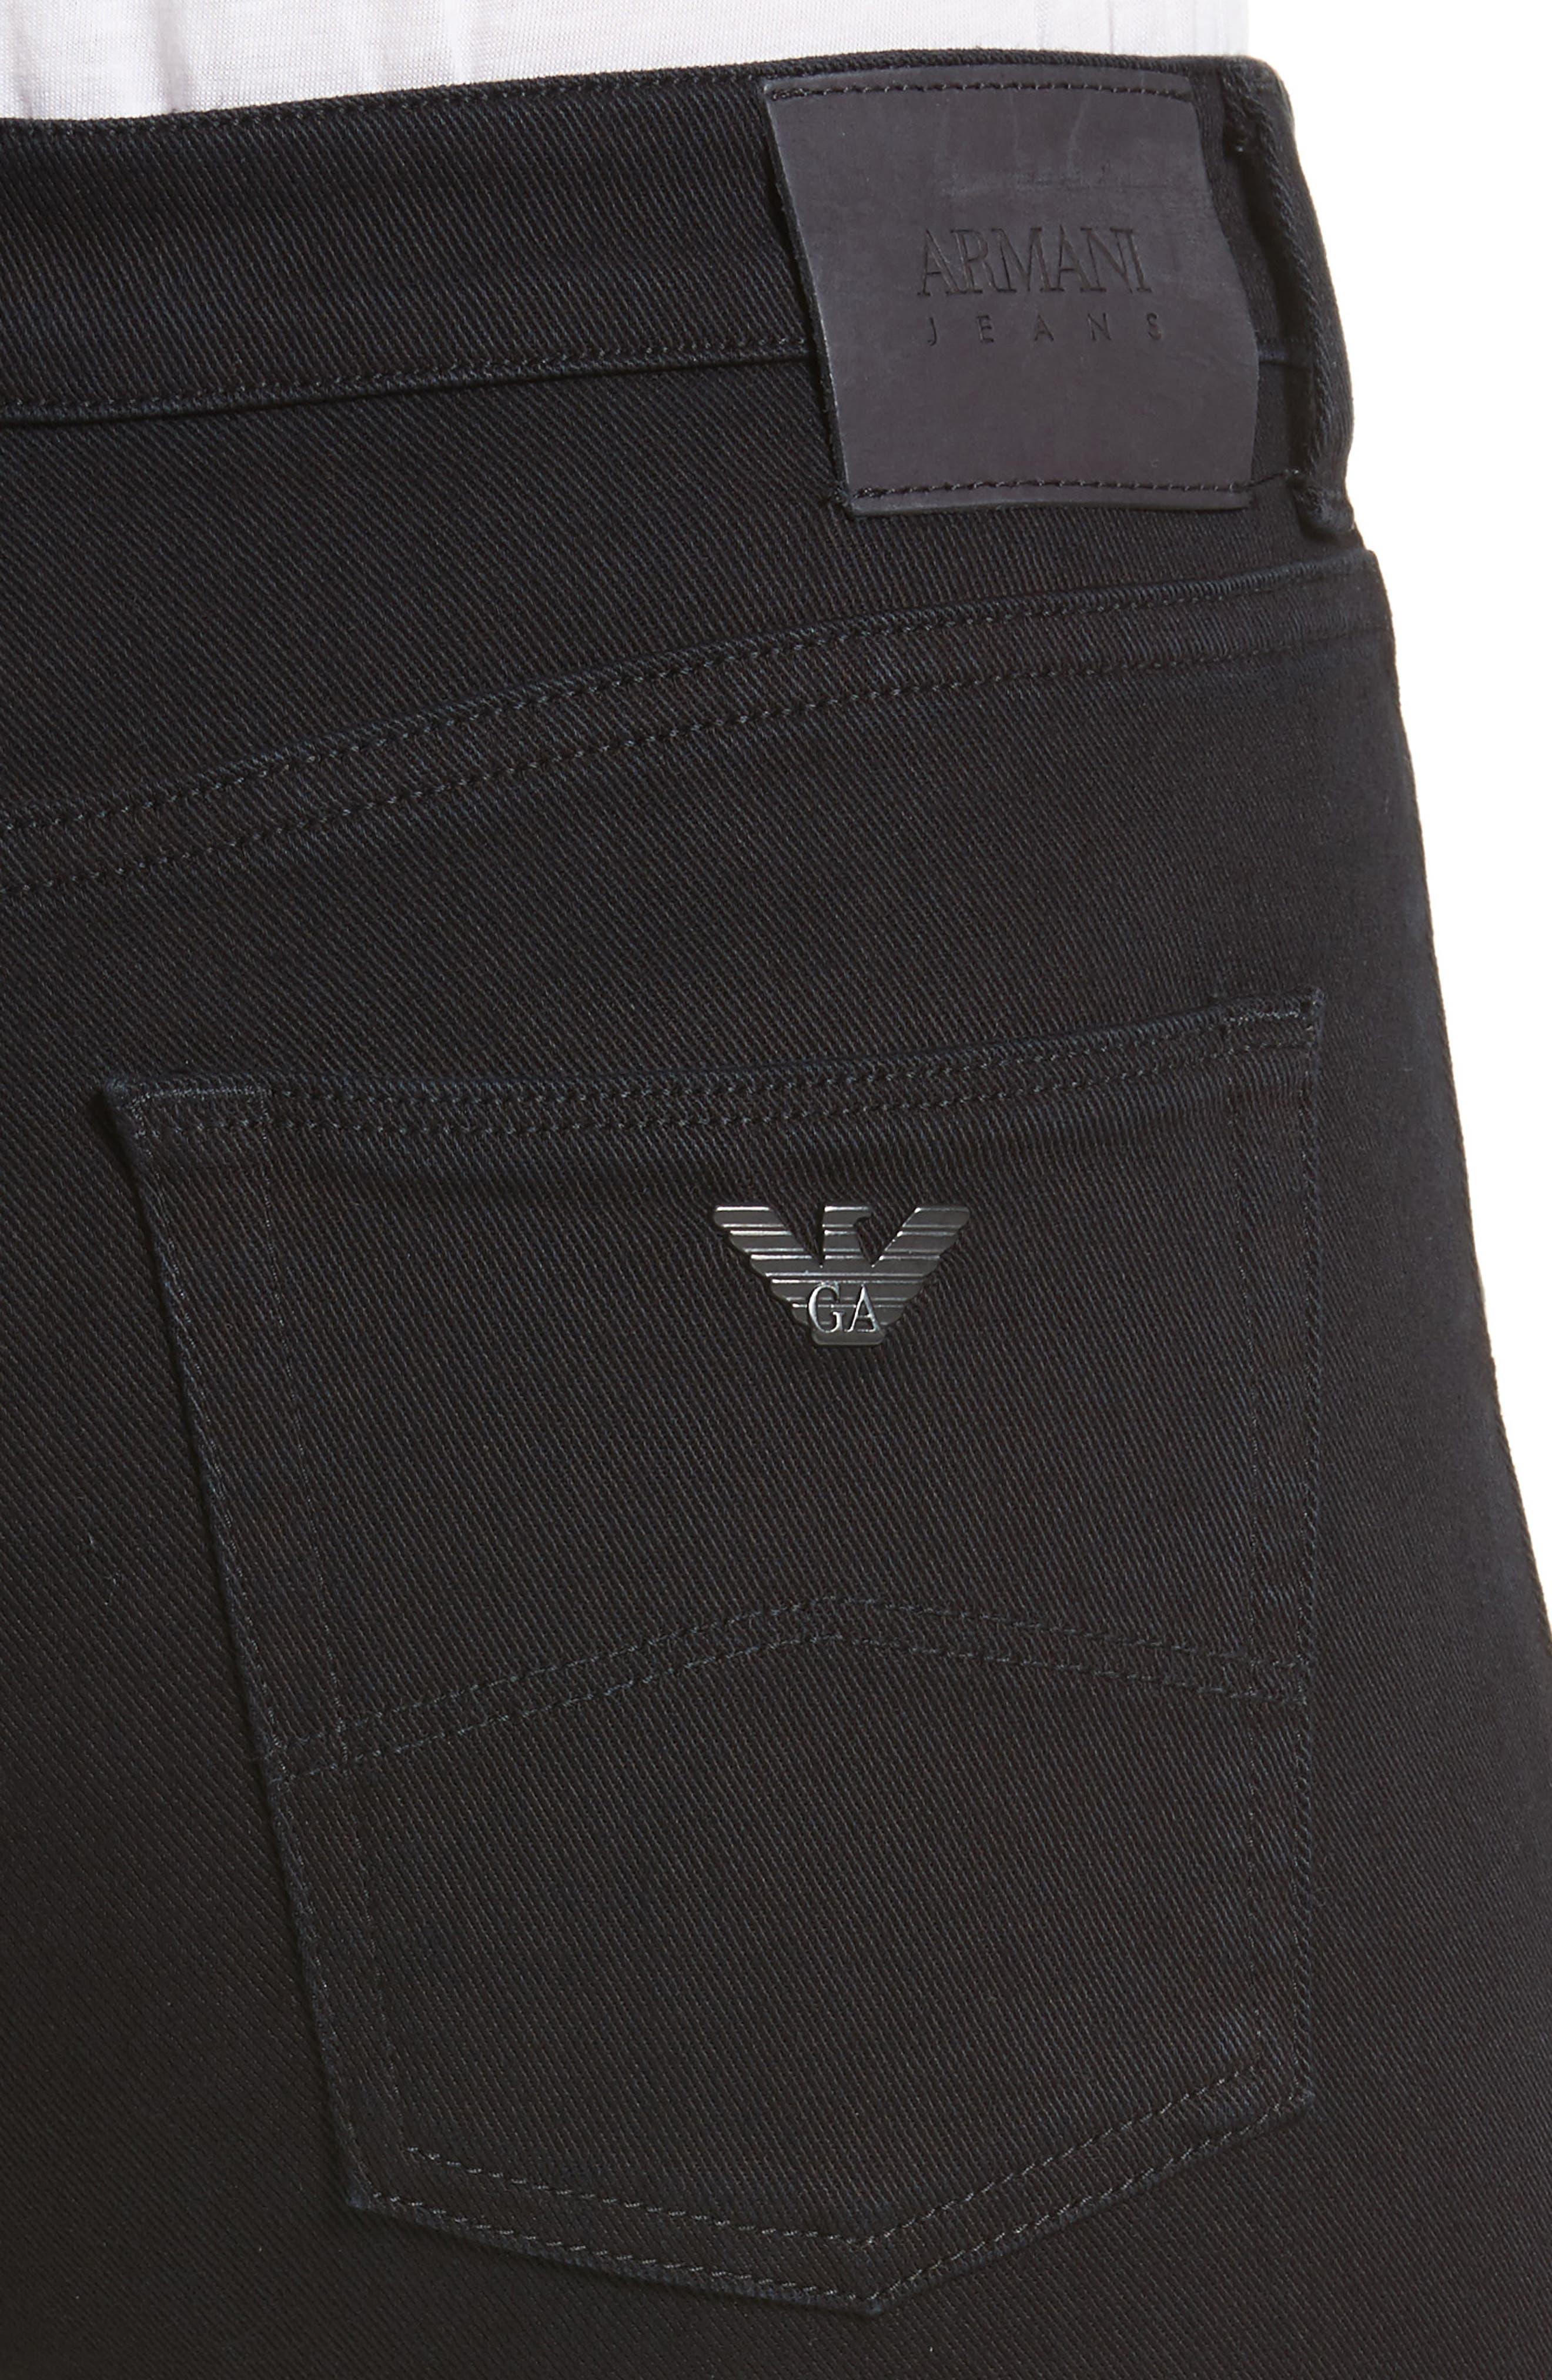 Straight Leg Jeans,                             Alternate thumbnail 4, color,                             Black